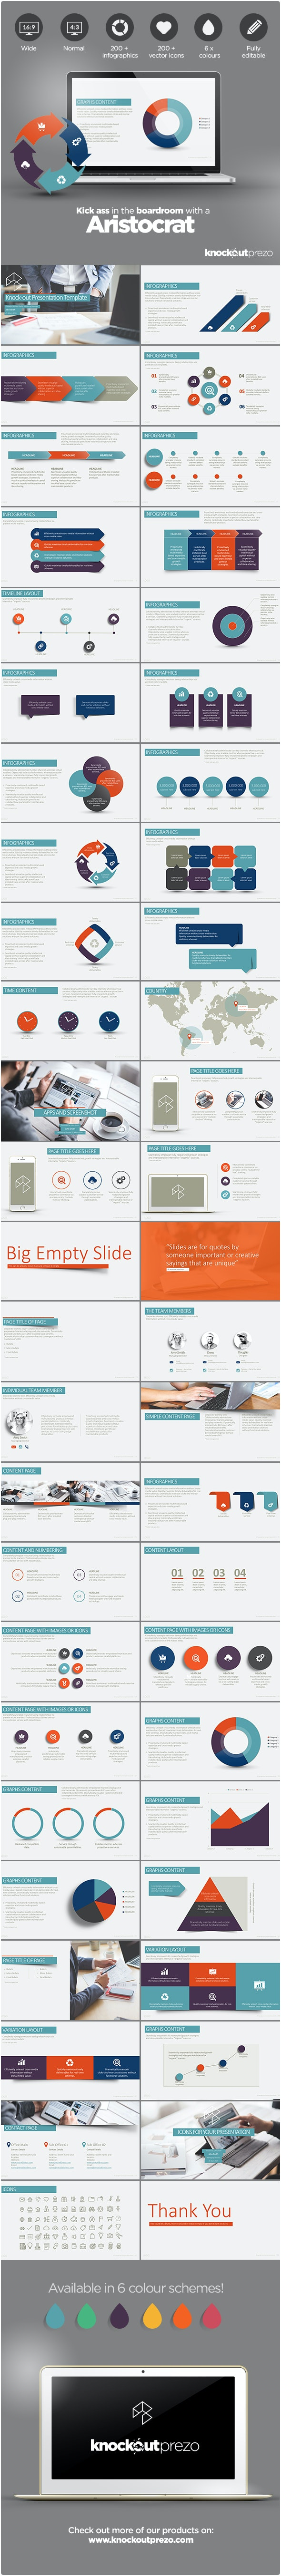 Aristocrat PowerPoint Template - Business PowerPoint Templates